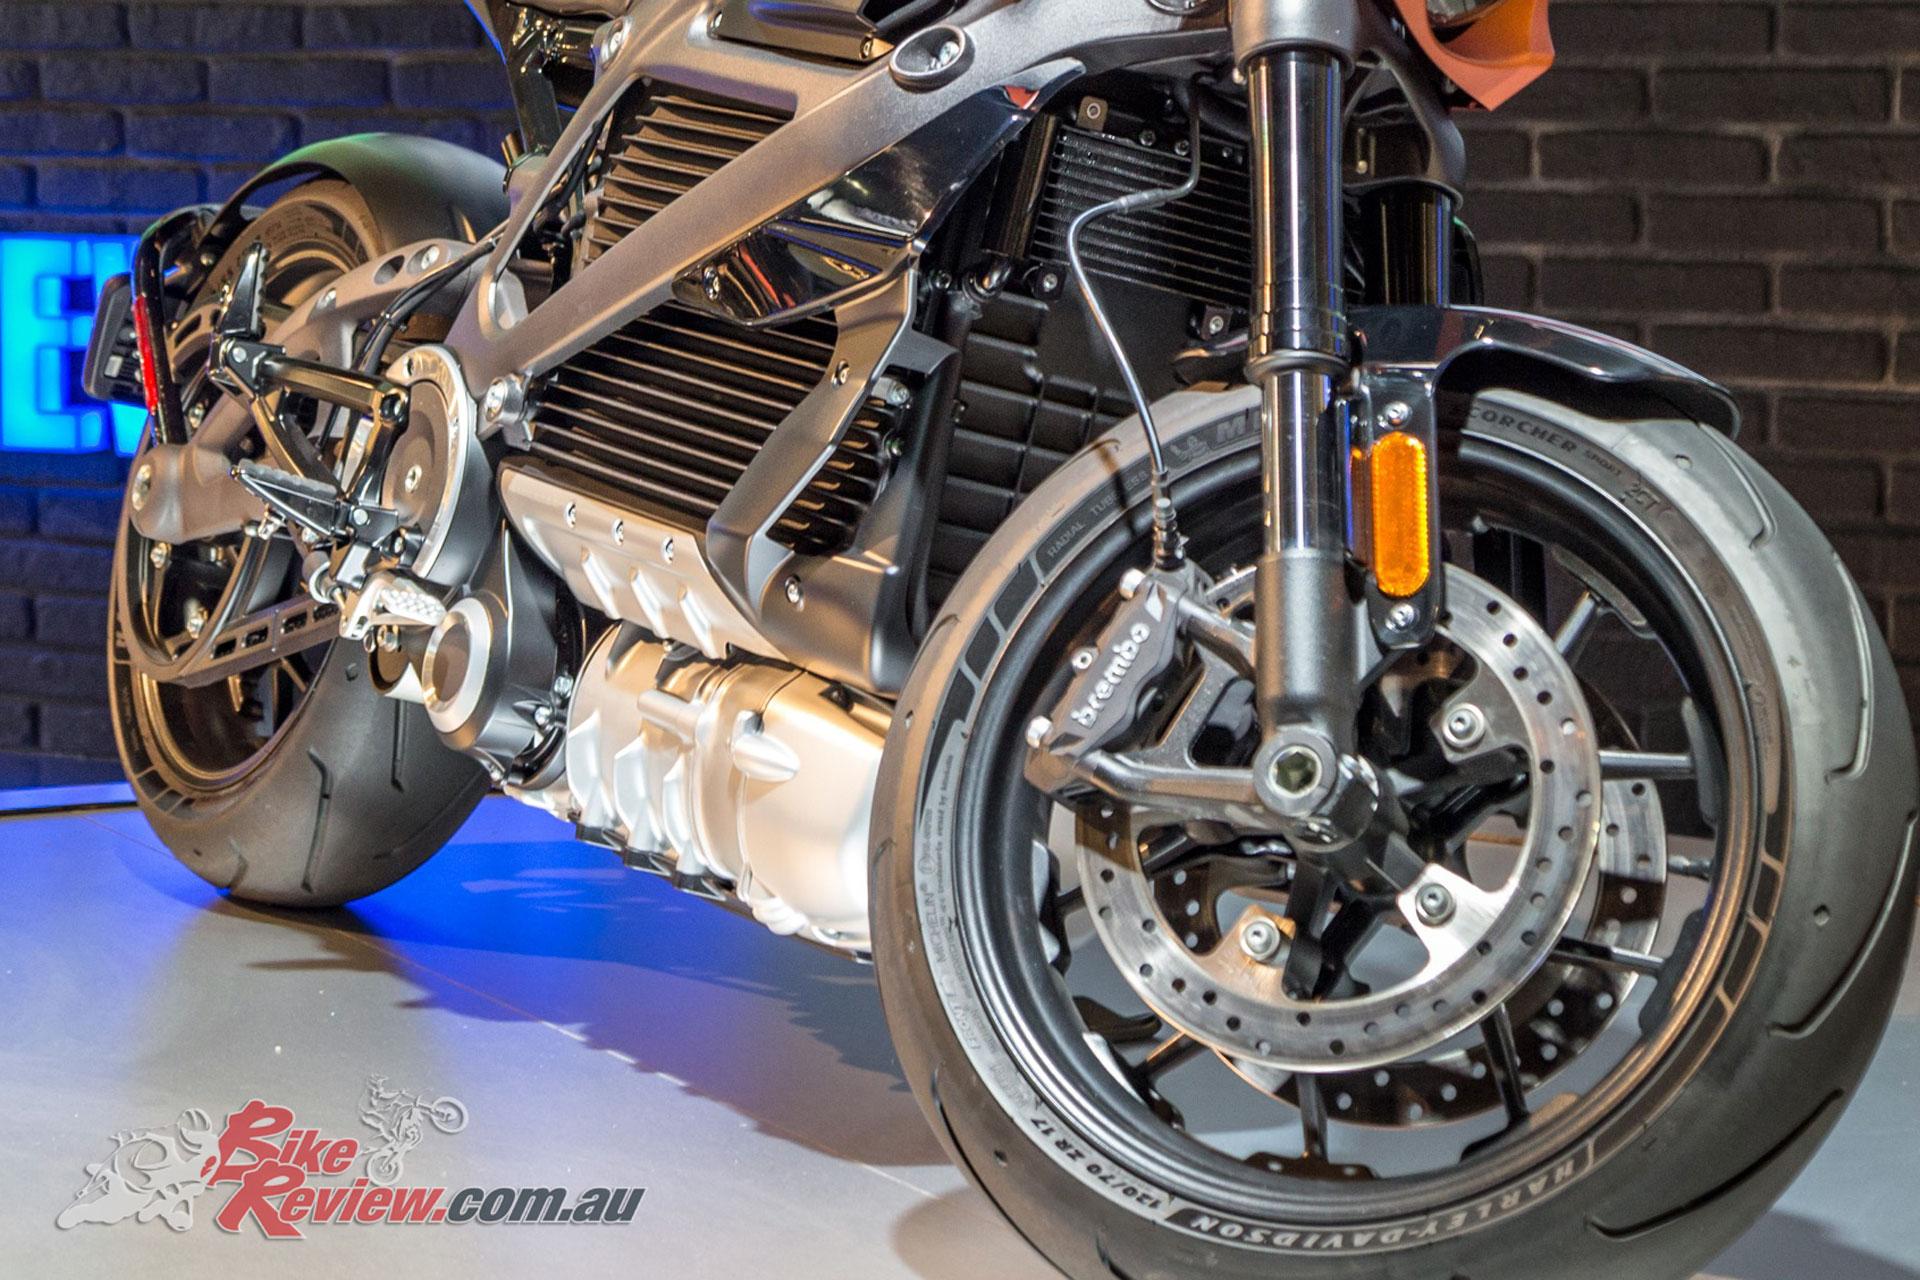 2020 Harley-Davidson Livewire electric cruiser